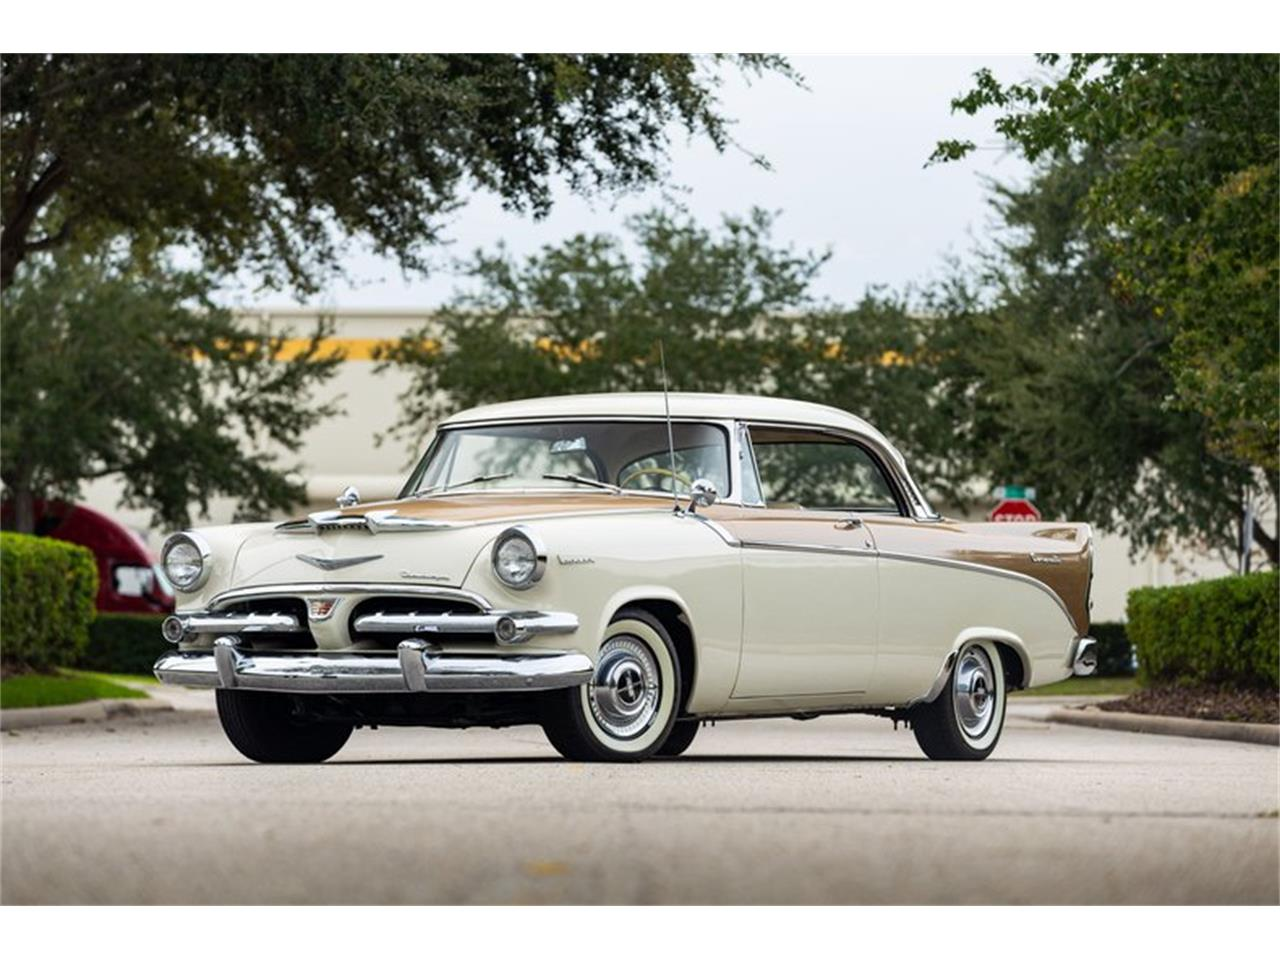 For Sale: 1956 Dodge Coronet in Orlando, Florida